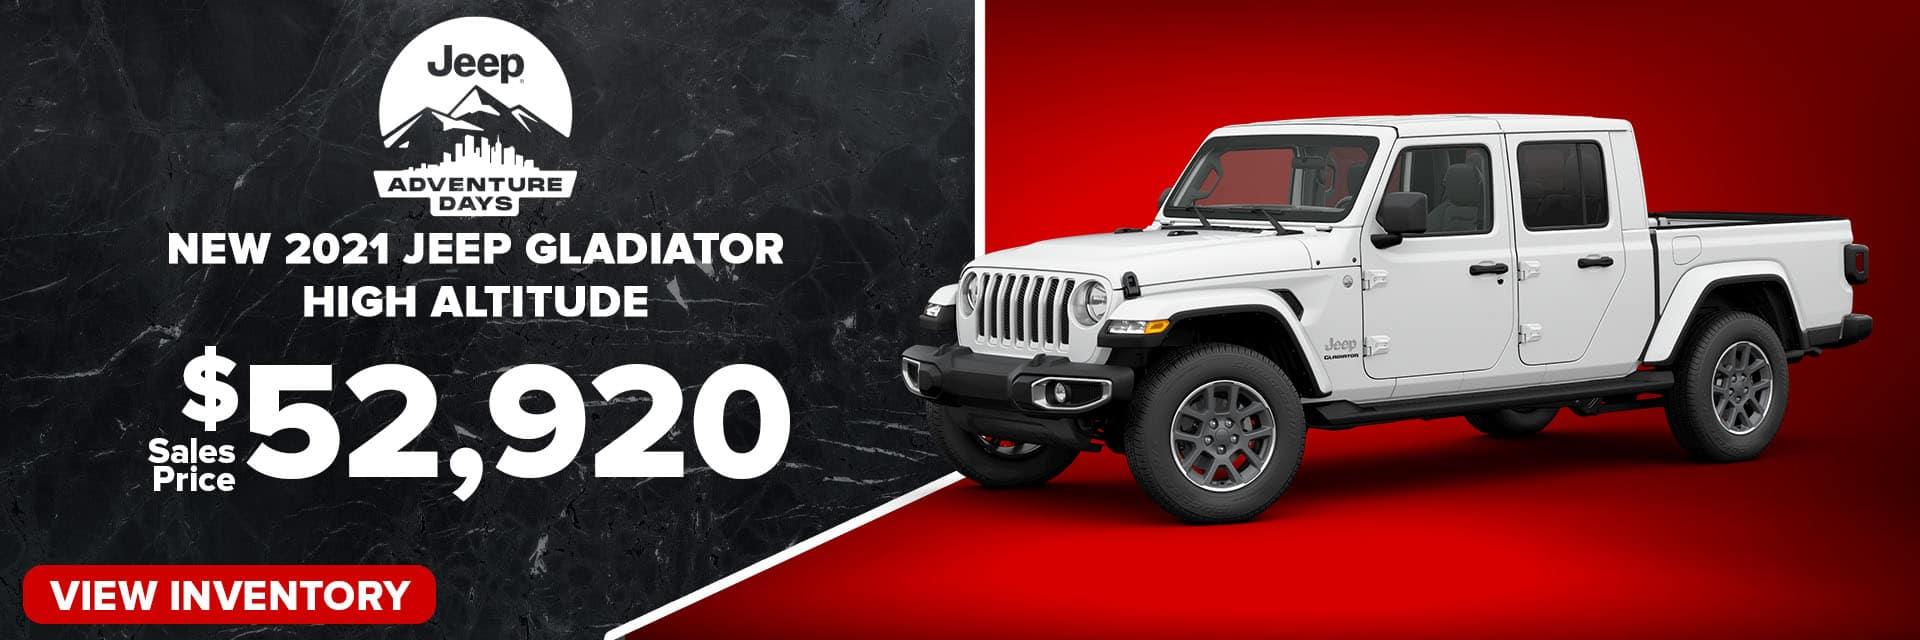 CLGO-September 2021-2021 Jeep Gladiator copy